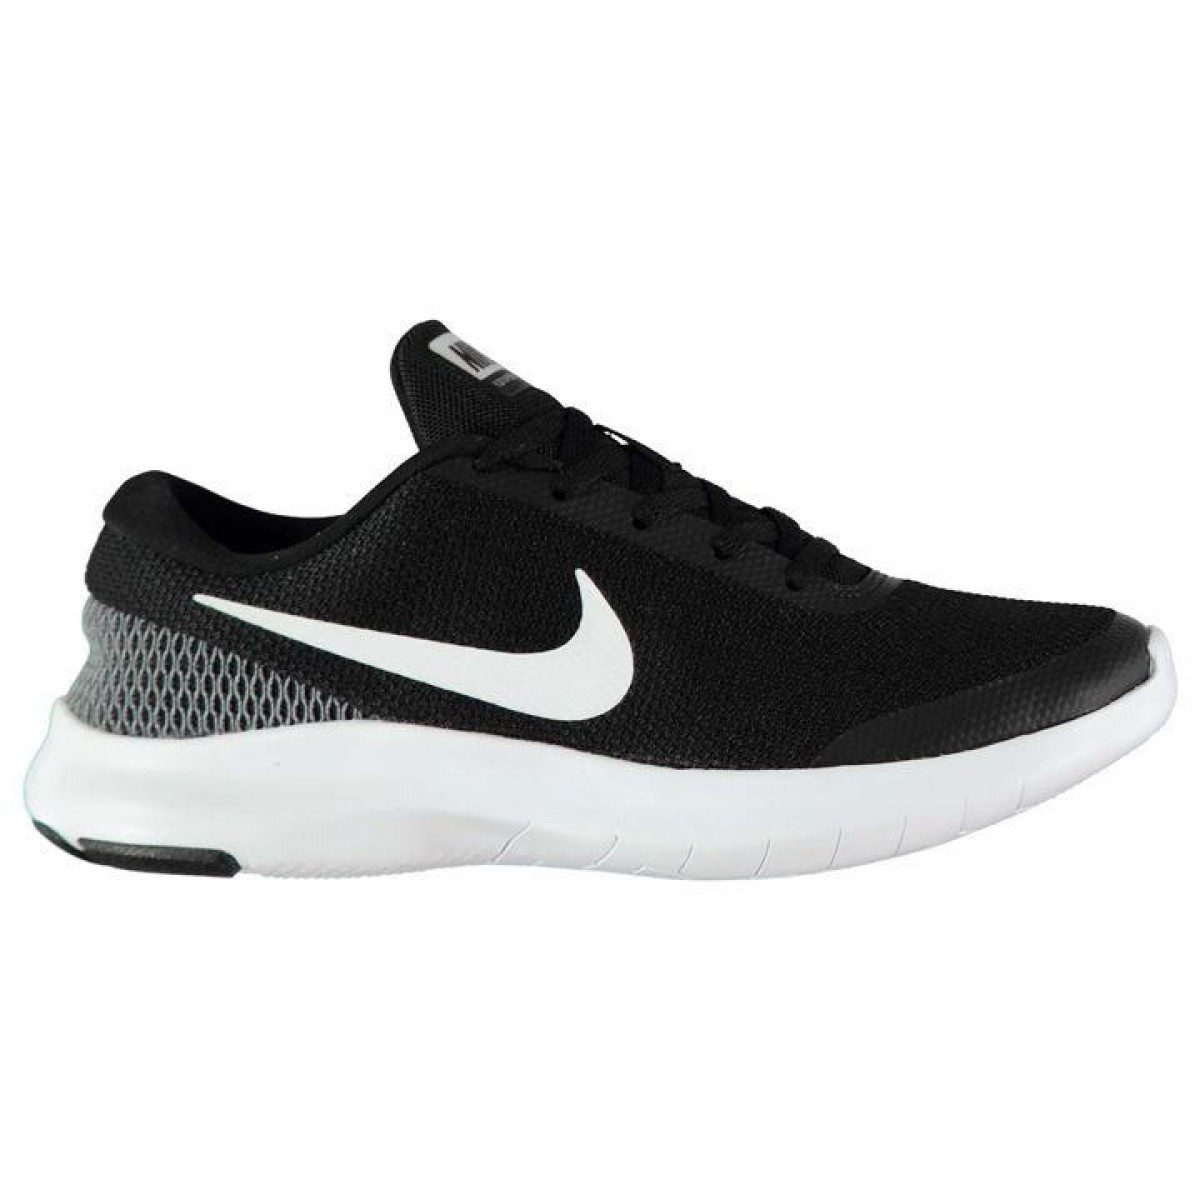 Кроссовки Nike Flex Experience 7 Black/White - Оригинал, фото 1